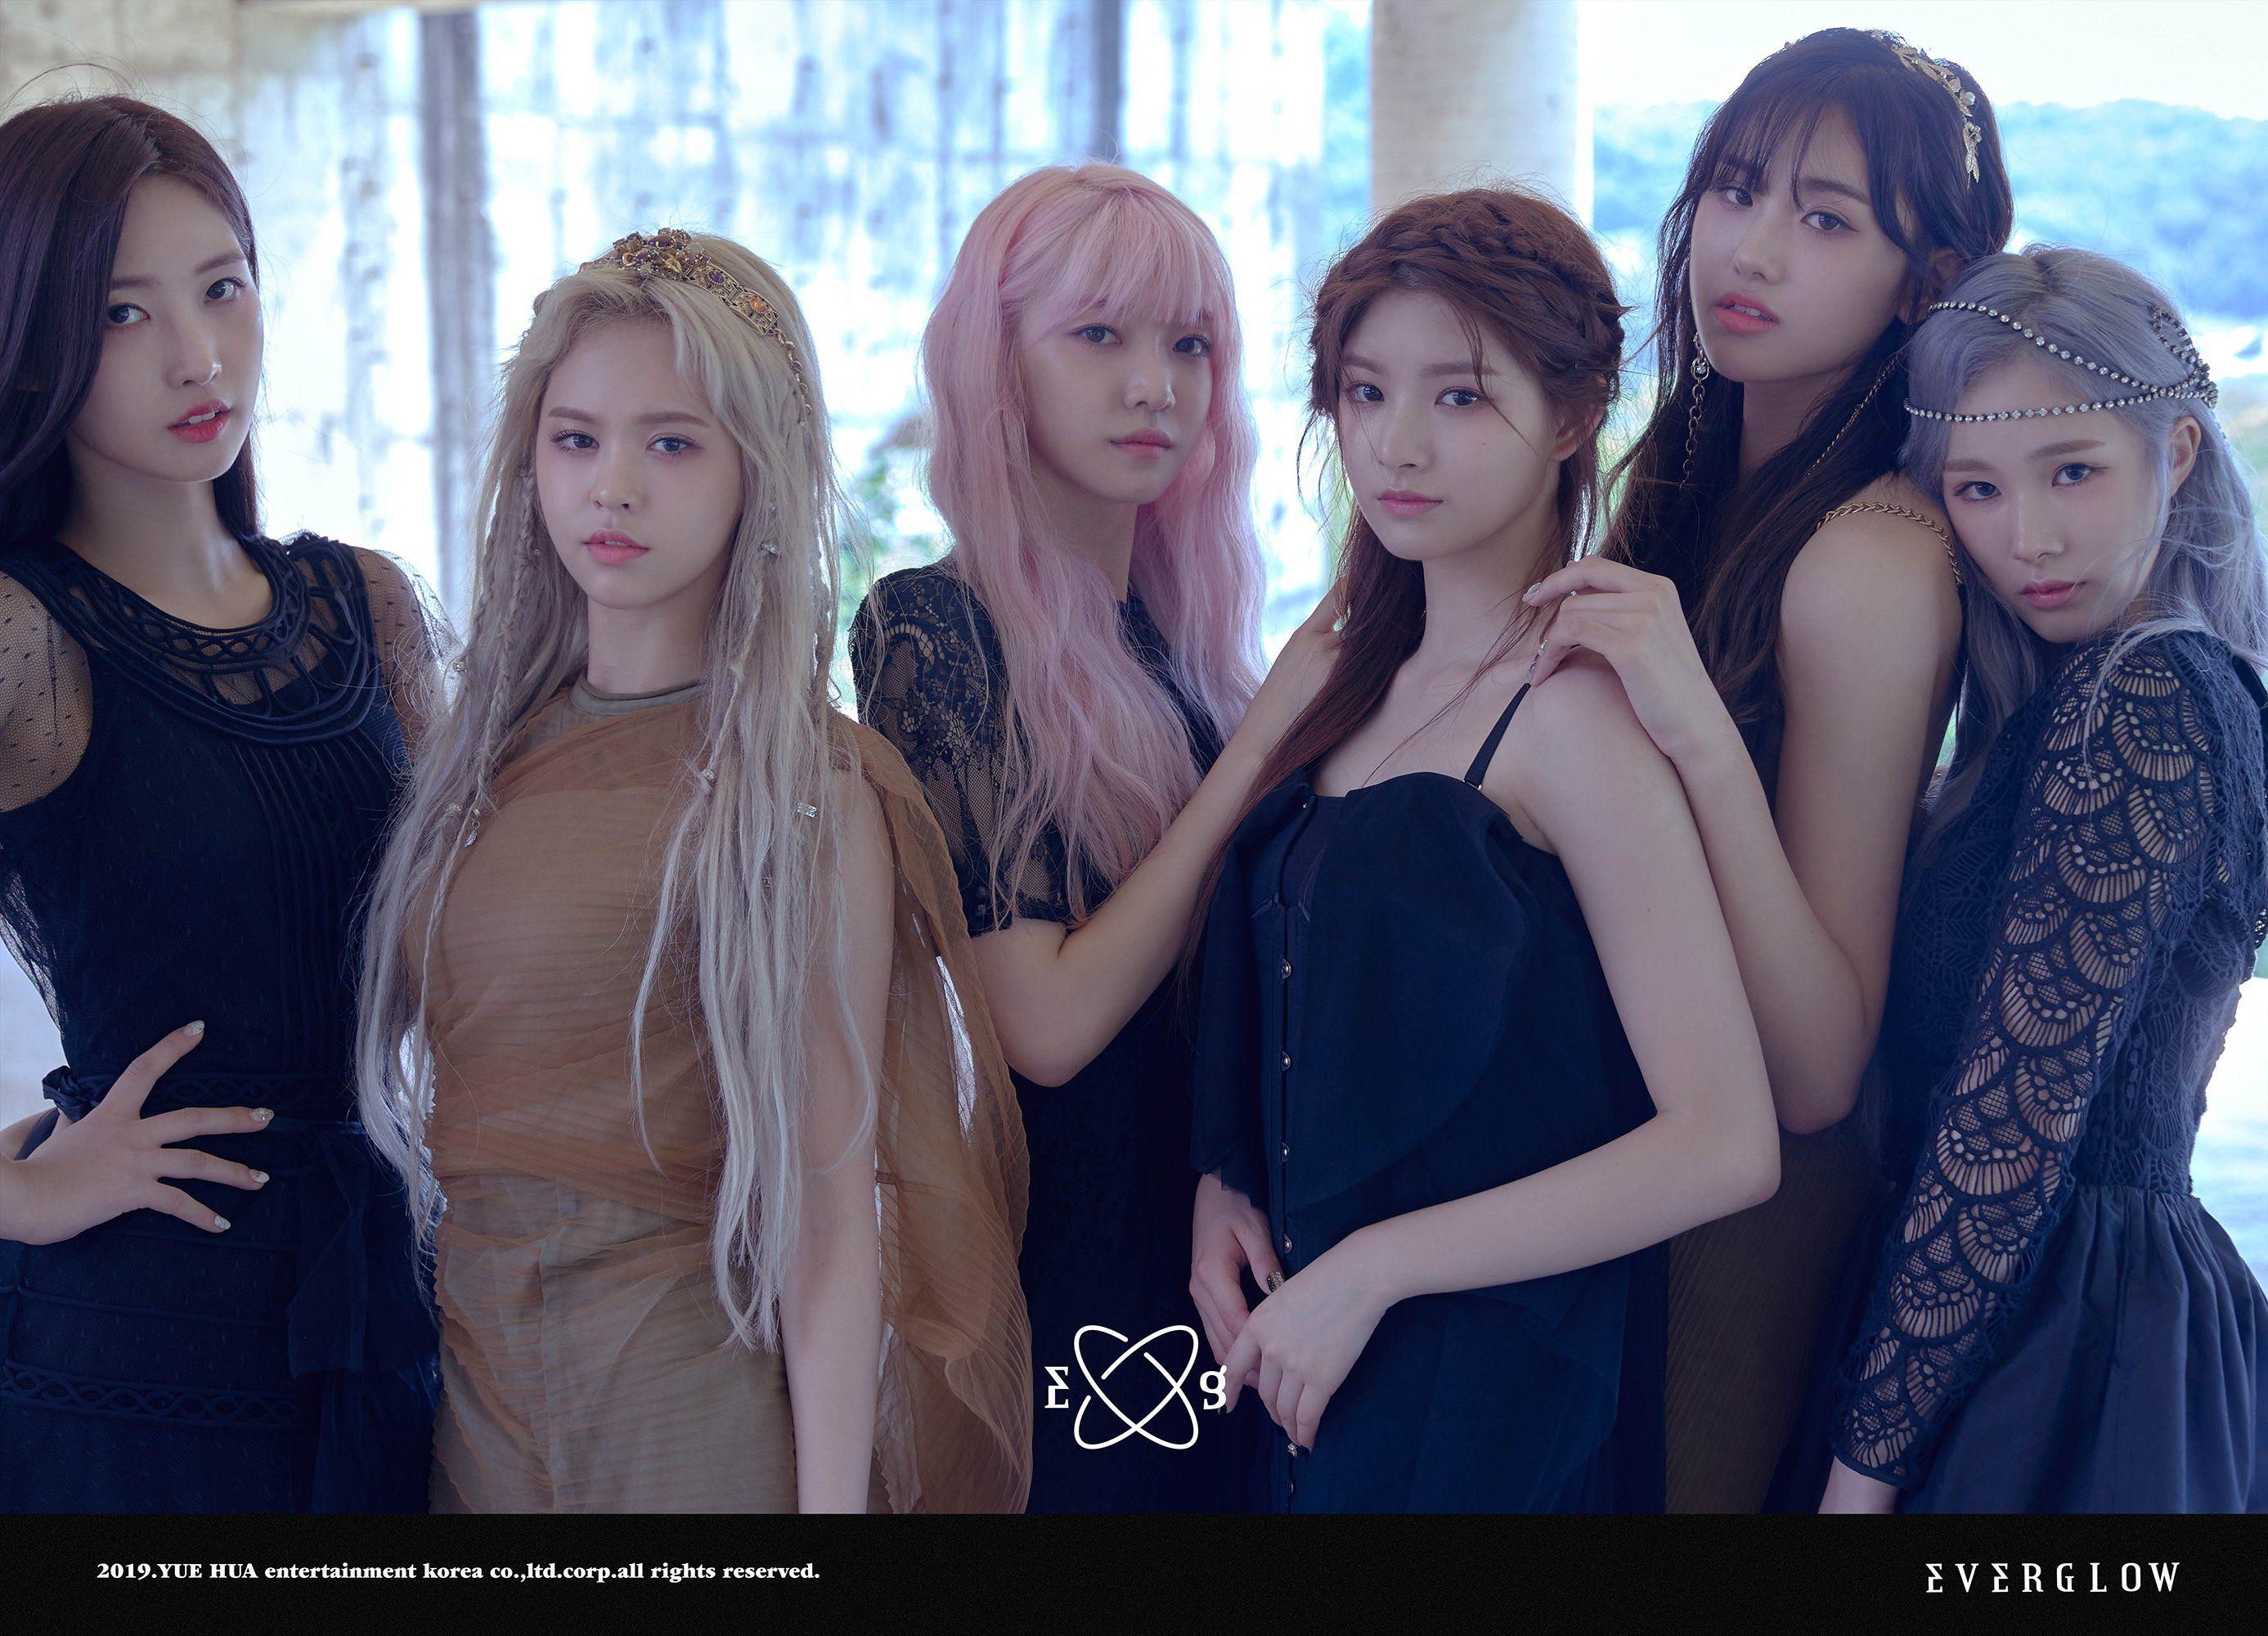 Everglow Adios Comeback Teaser Image Hush Hush Kpop Girls Kpop Girl Groups